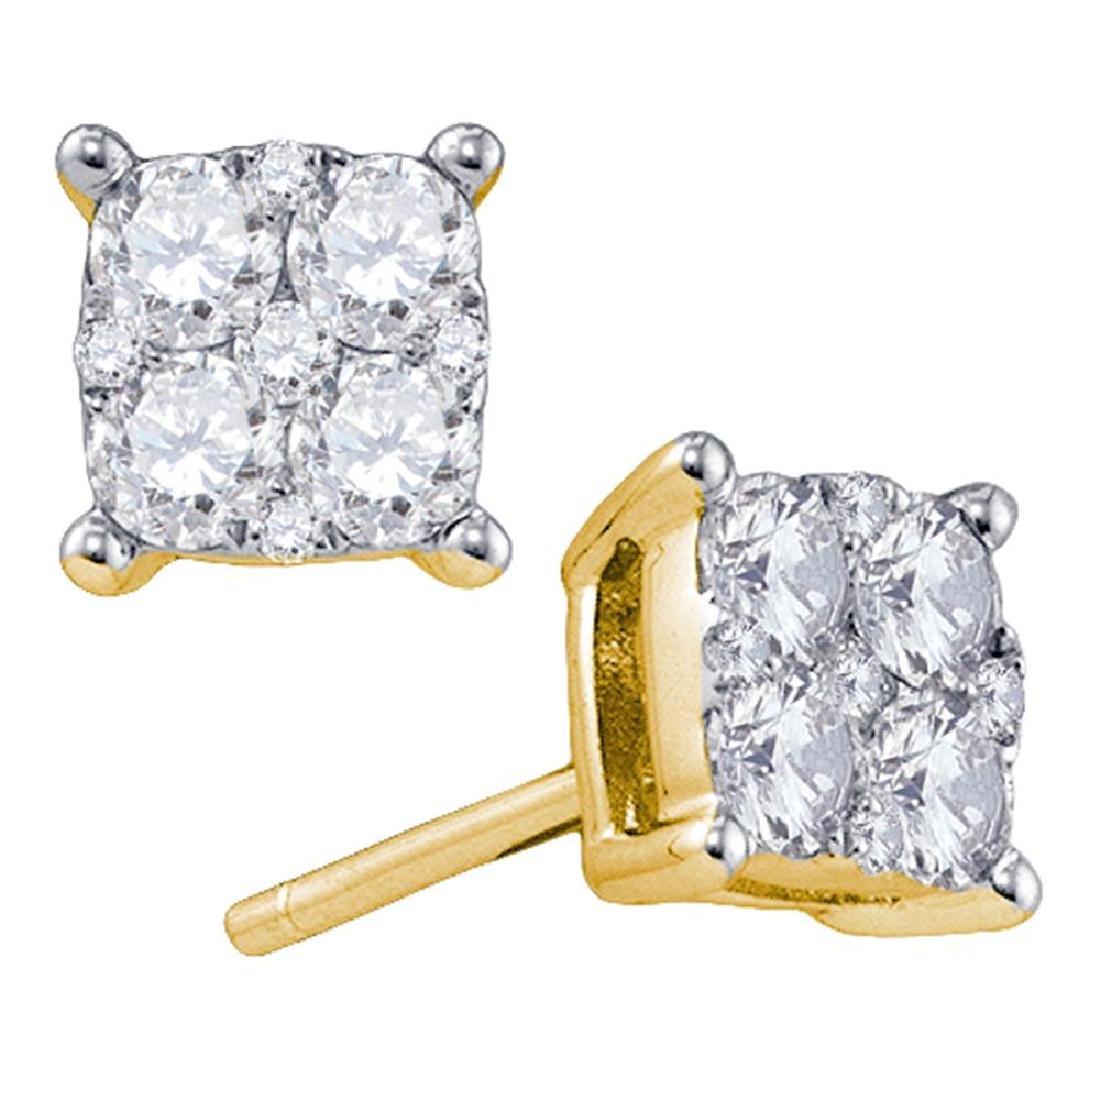 1.34 CTW Diamond Square Cluster Screwback Earrings 18KT